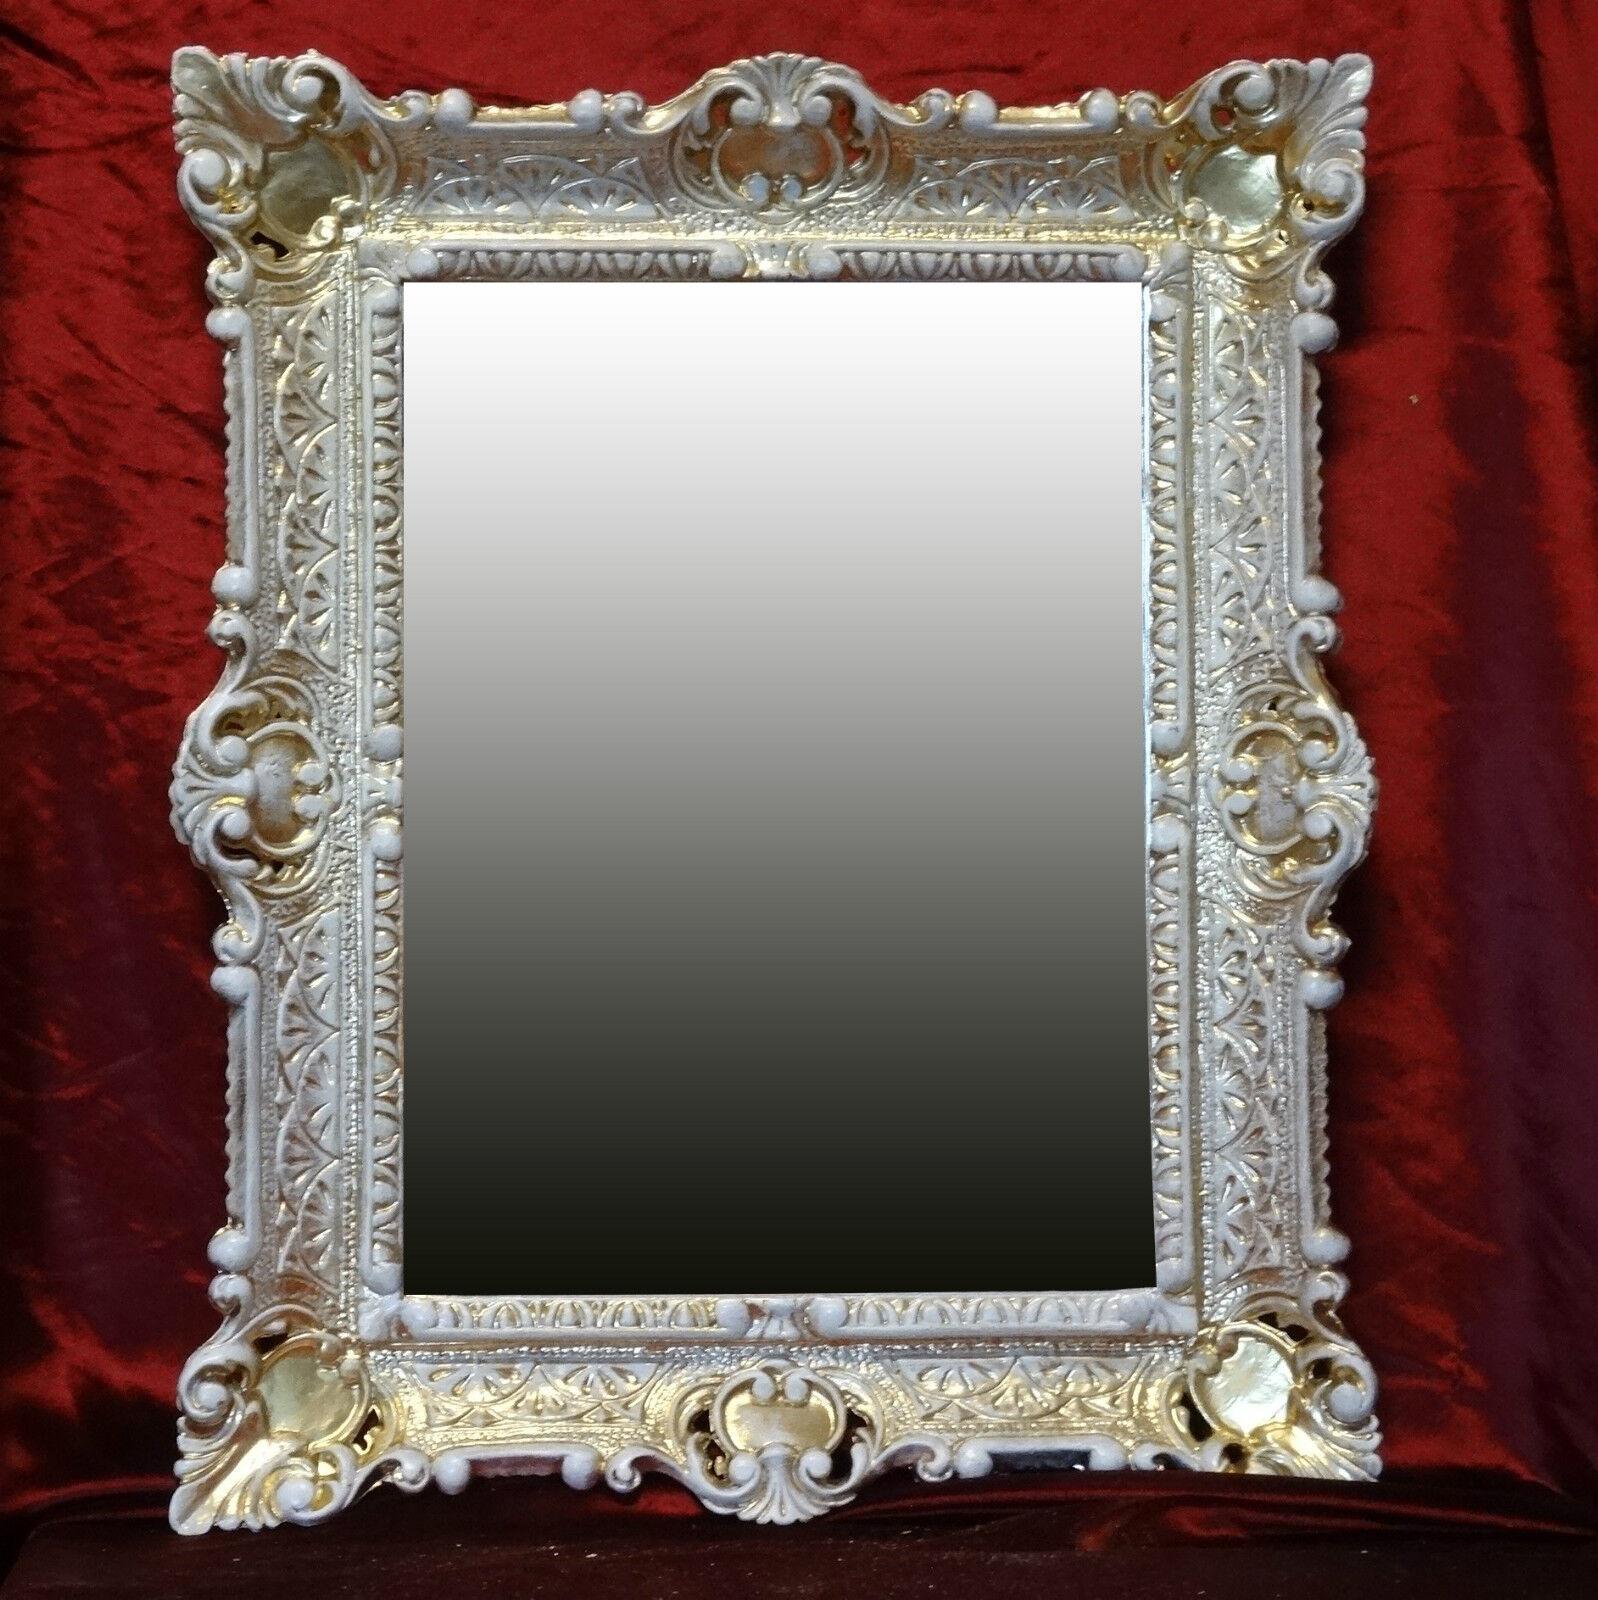 Wall mirror gold white antique baroque repro bathroom for Baroque bathroom mirror